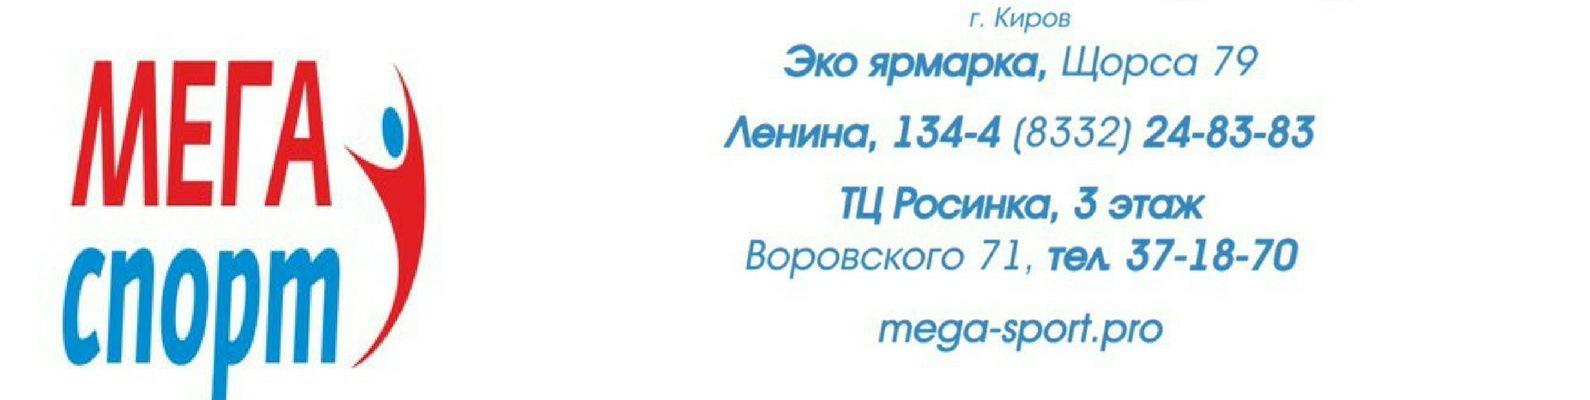 e5612dc580d27c Гипермаркет Мегаспорт, г.Киров   ВКонтакте